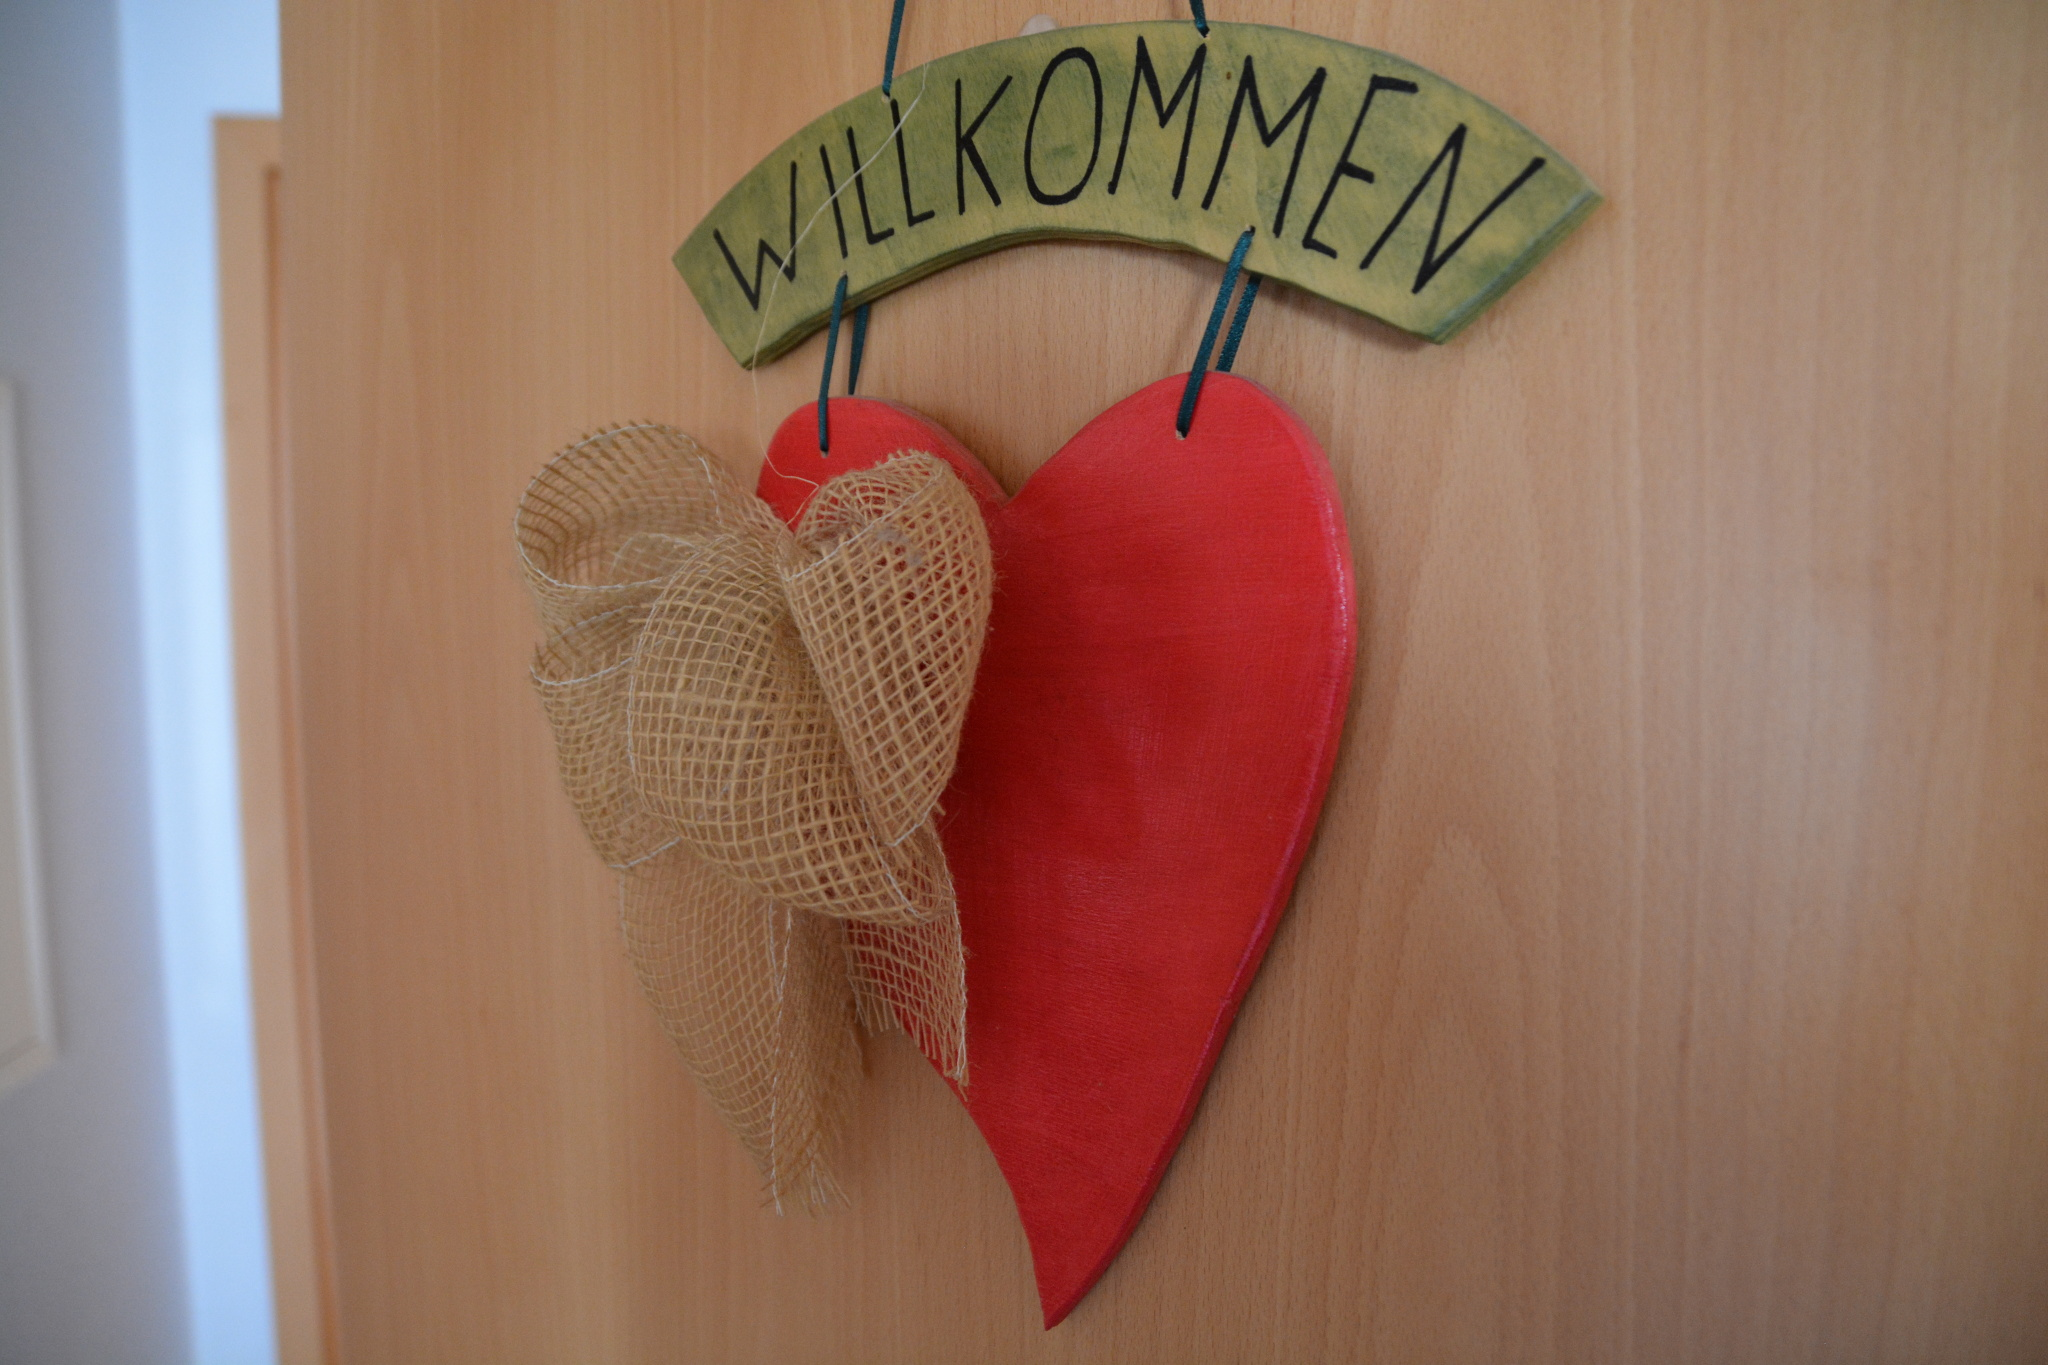 http://www.pfalzherz.de/wp-content/uploads/2019/02/1-Deko-Willkommen-2048-x-1365.jpg